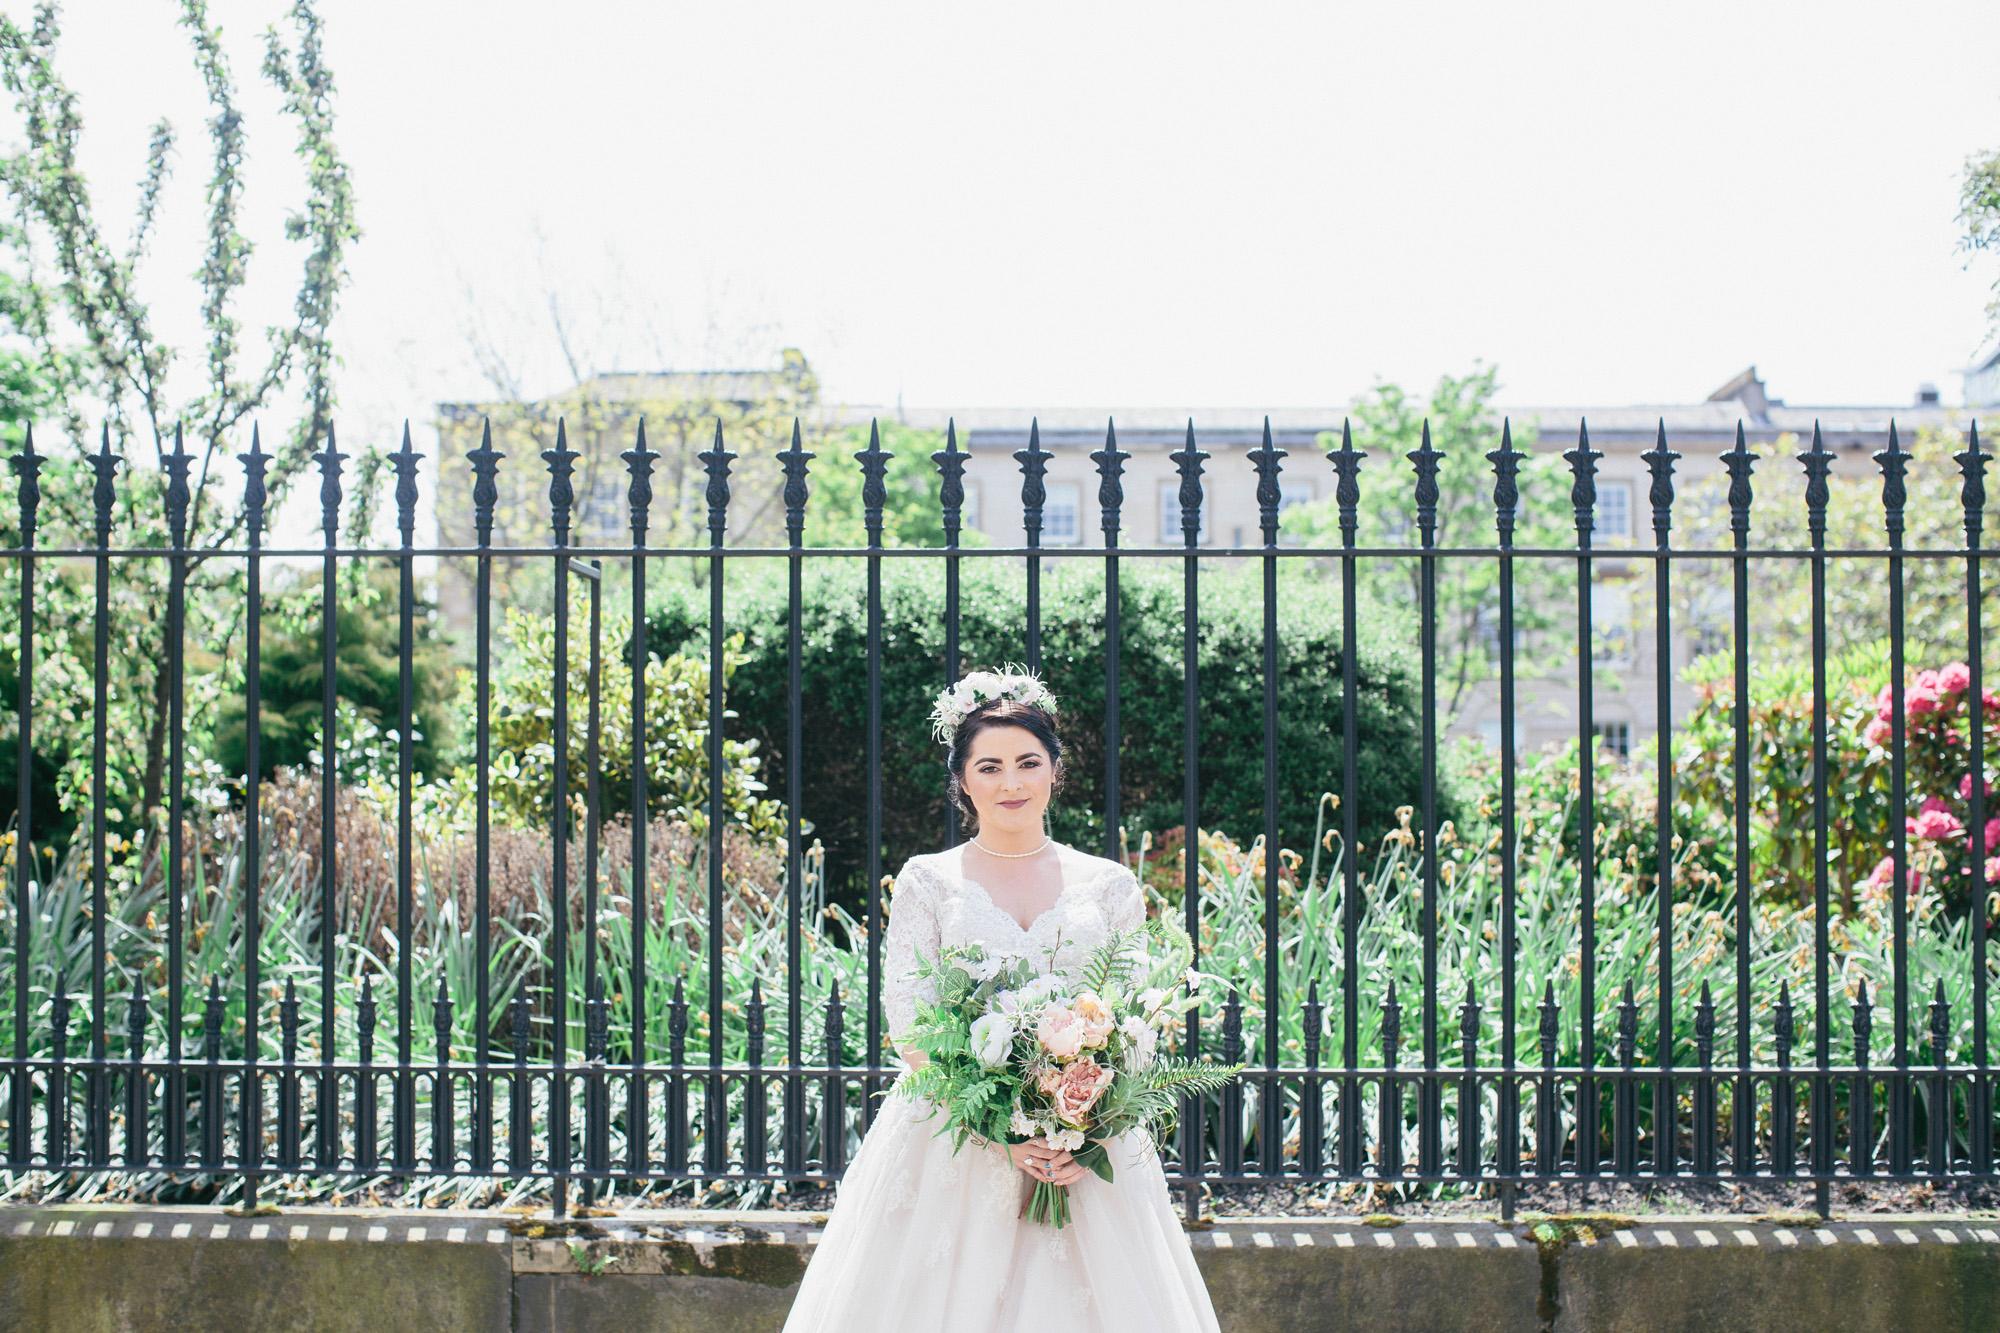 Quirky Wedding Photography Glasgow West End 015.jpg